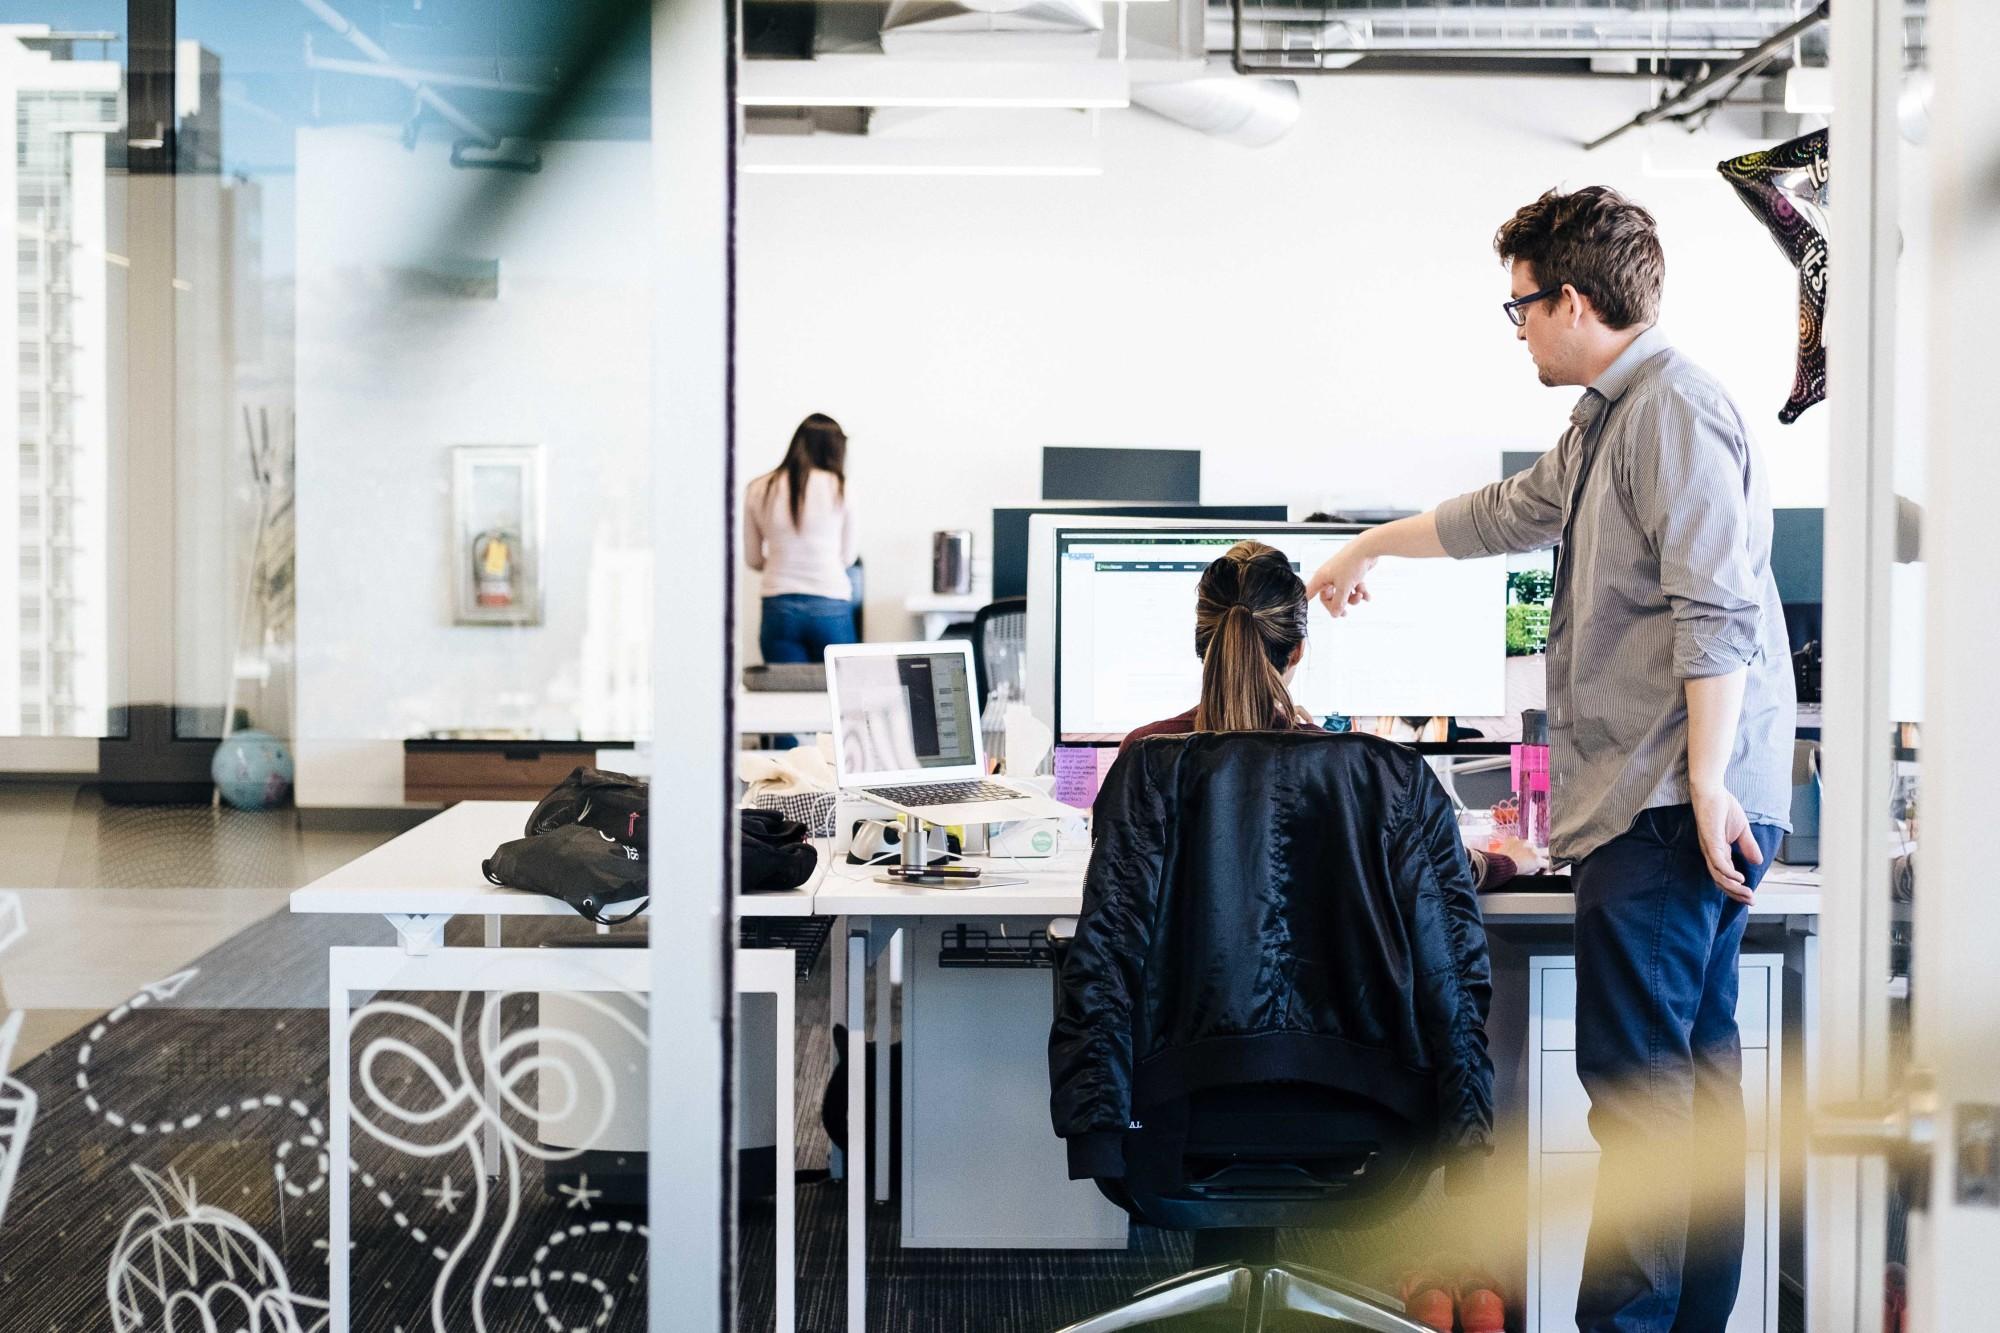 Baunfire | Services | Silicon Valley Digital Agency in San